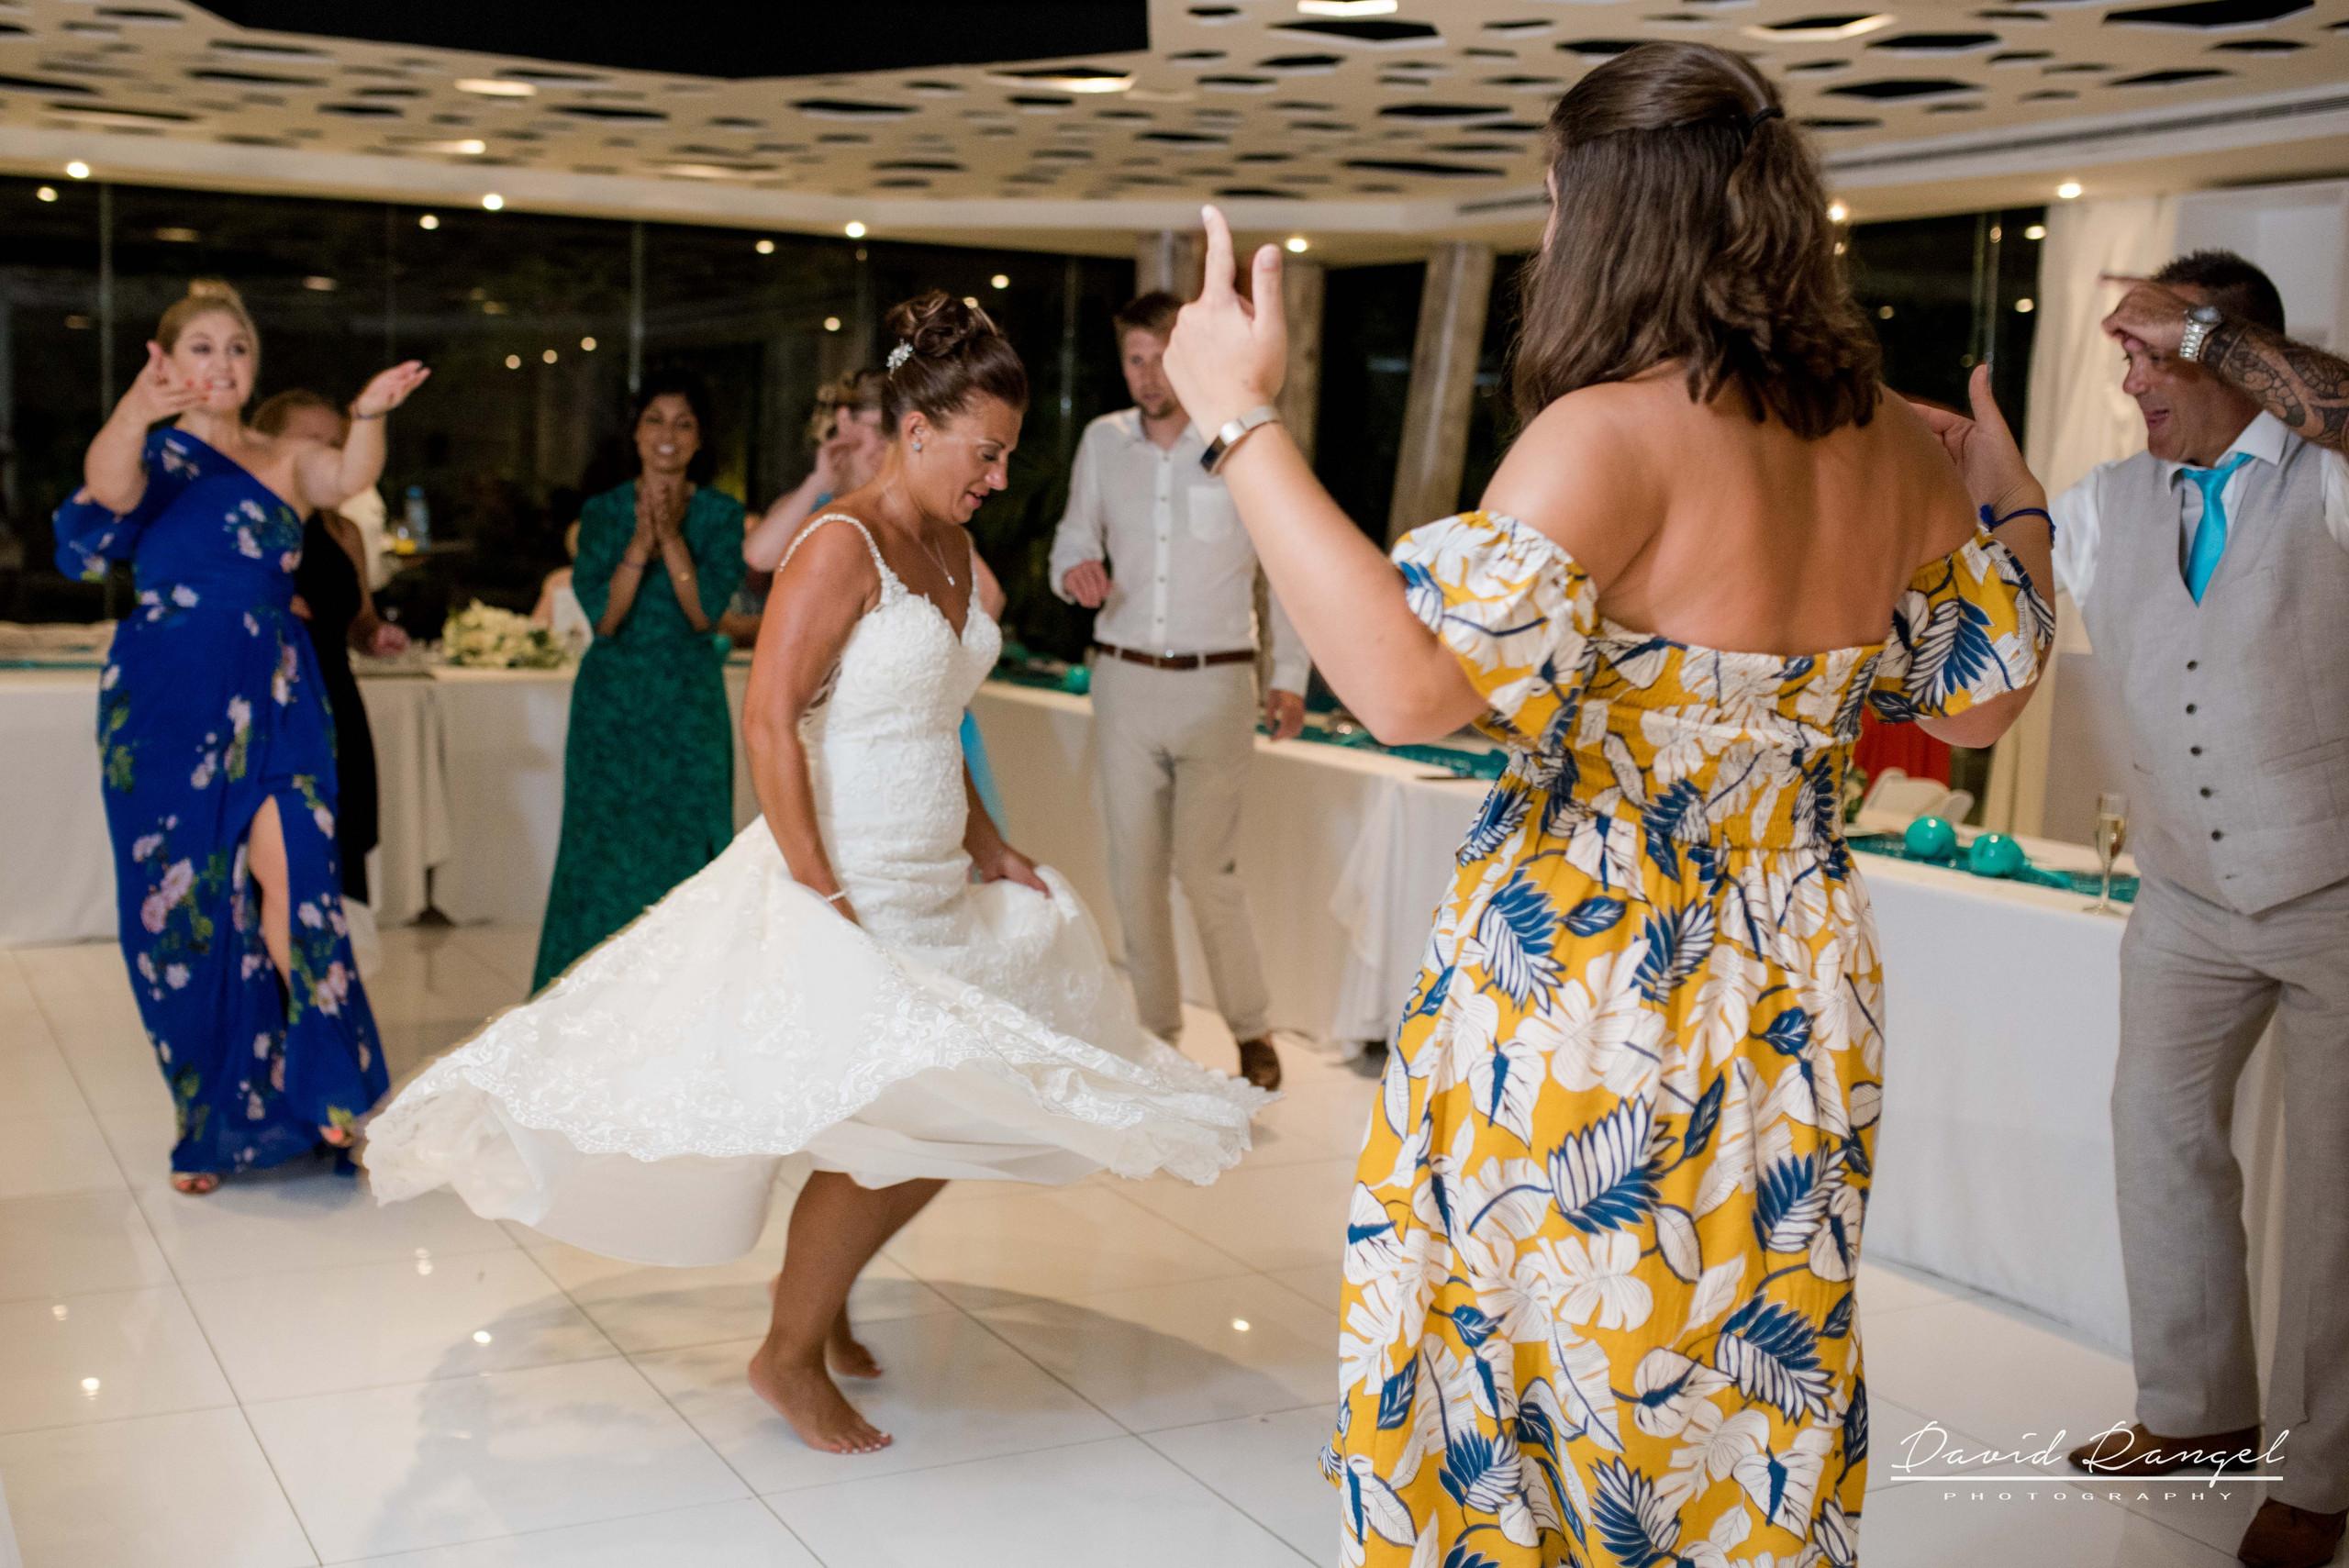 bride+dance+wedding+dress+photo